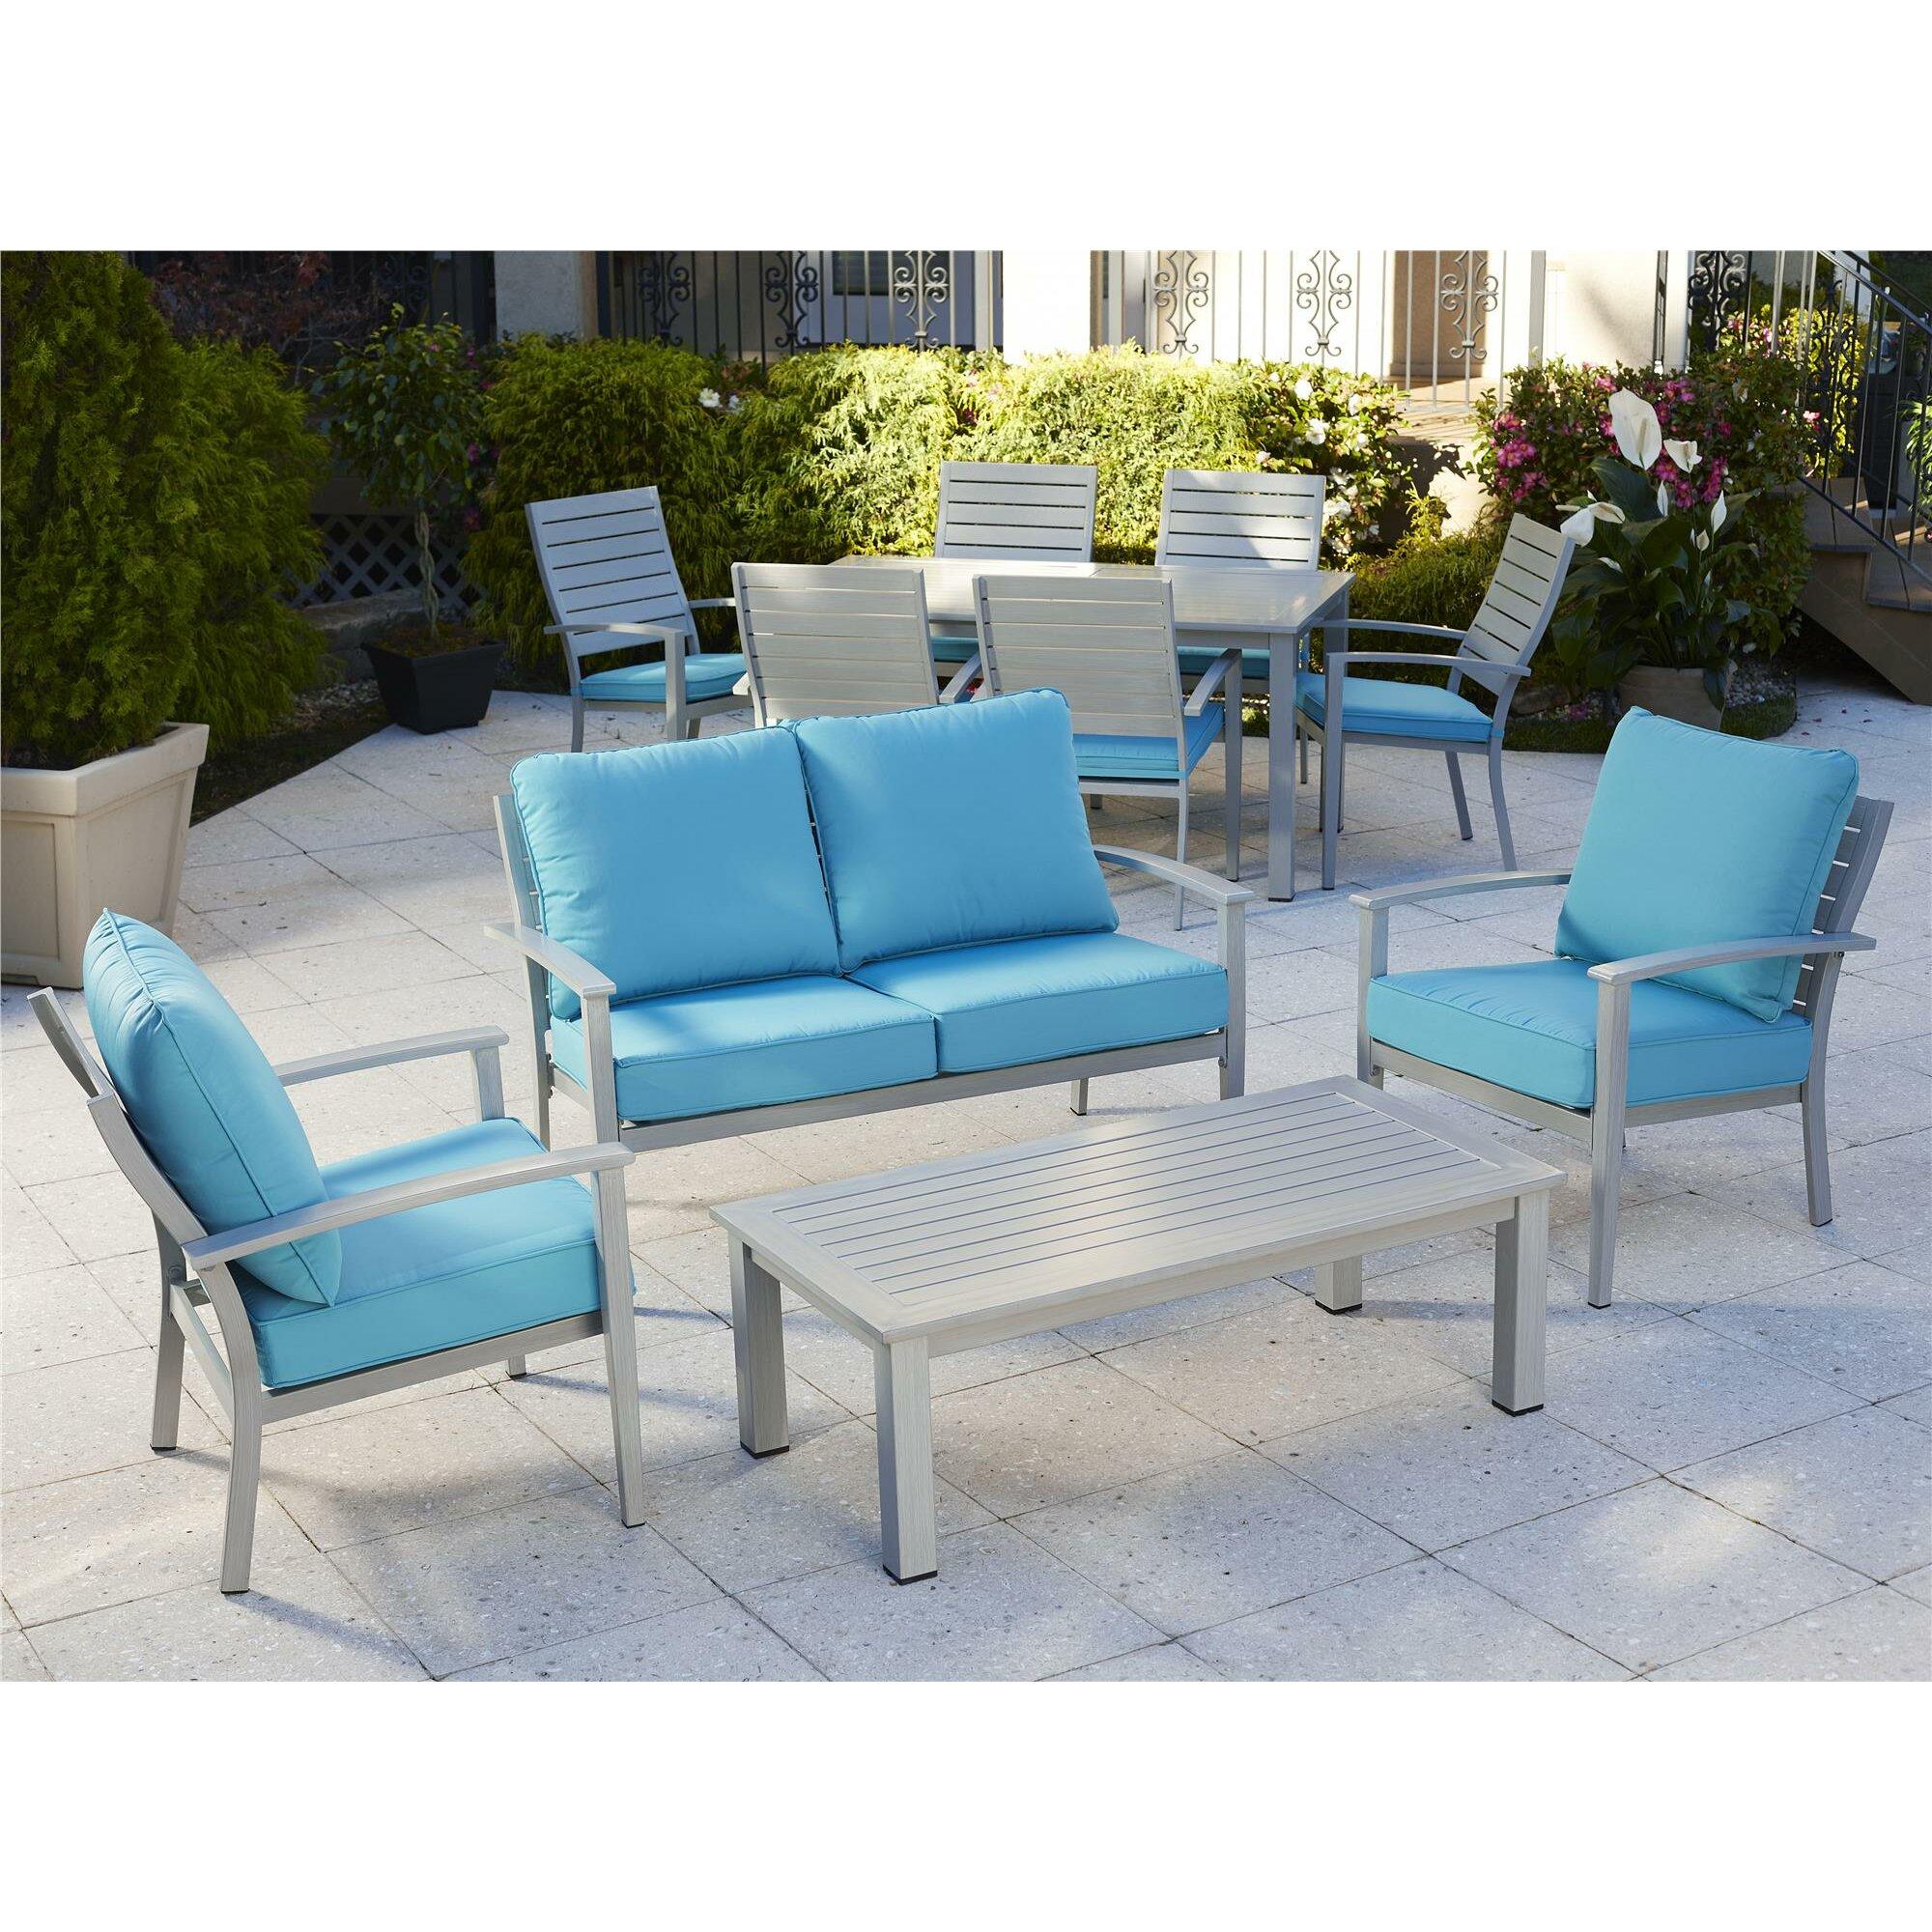 Fresh Aluminum Patio Furniture Clearance